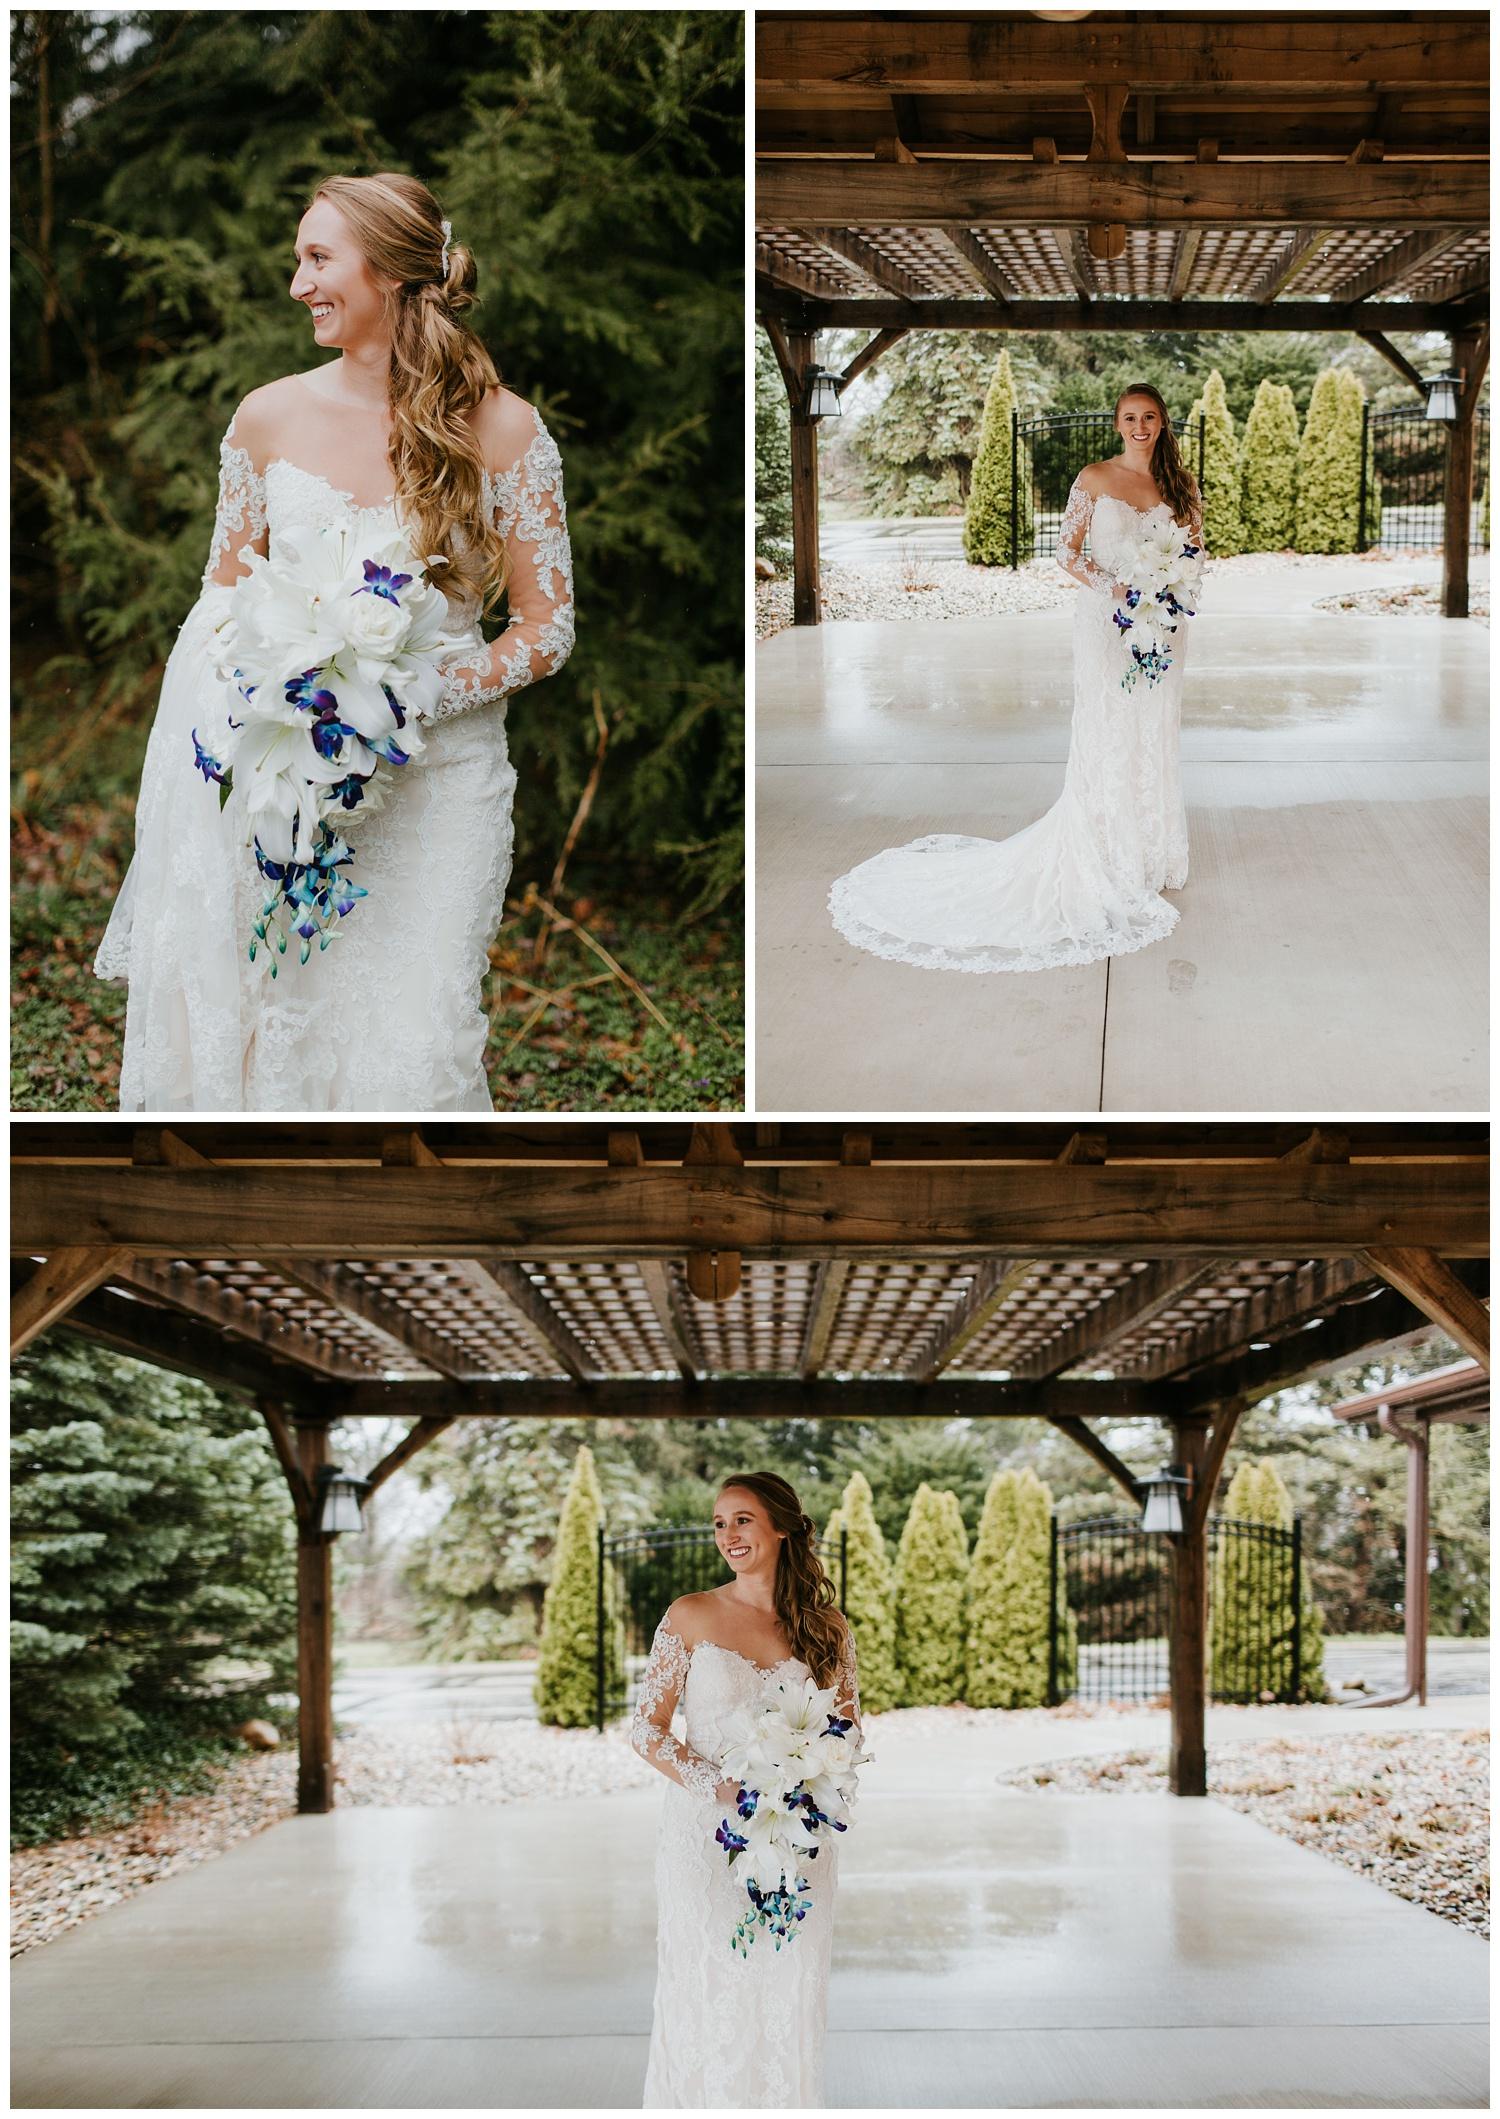 Shadowland Silver Beach St. Joseph Wedding Photographer Rainy Wedding5.jpg